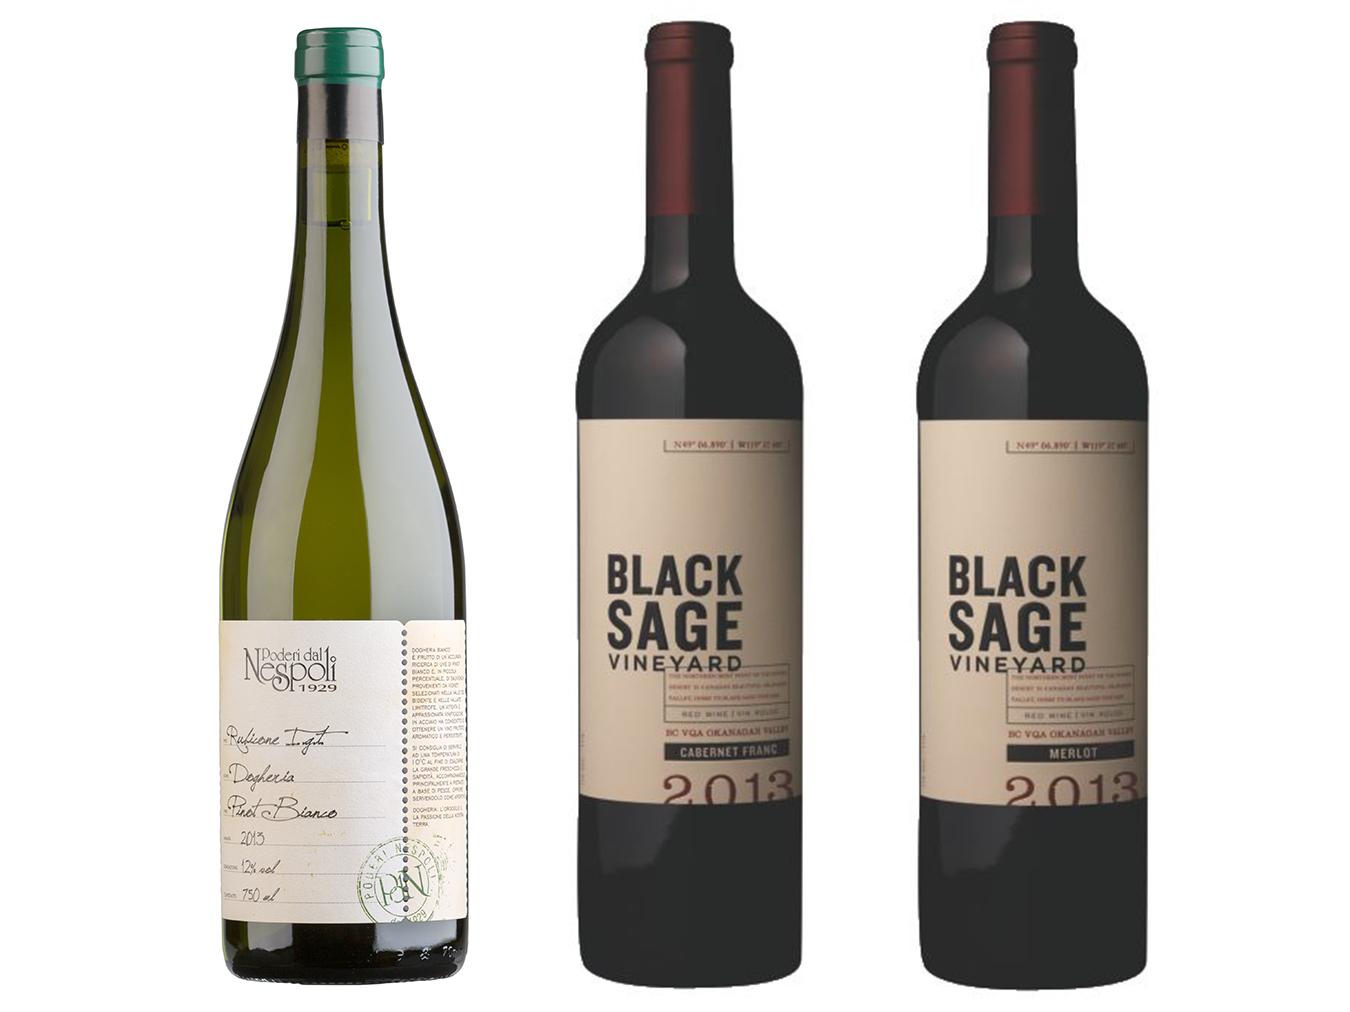 MONTE Blog: Wine Wednesday Poderi dal Nespoli Dogheria, Black Sage Vineyard Merlot, and Cabernet Franc